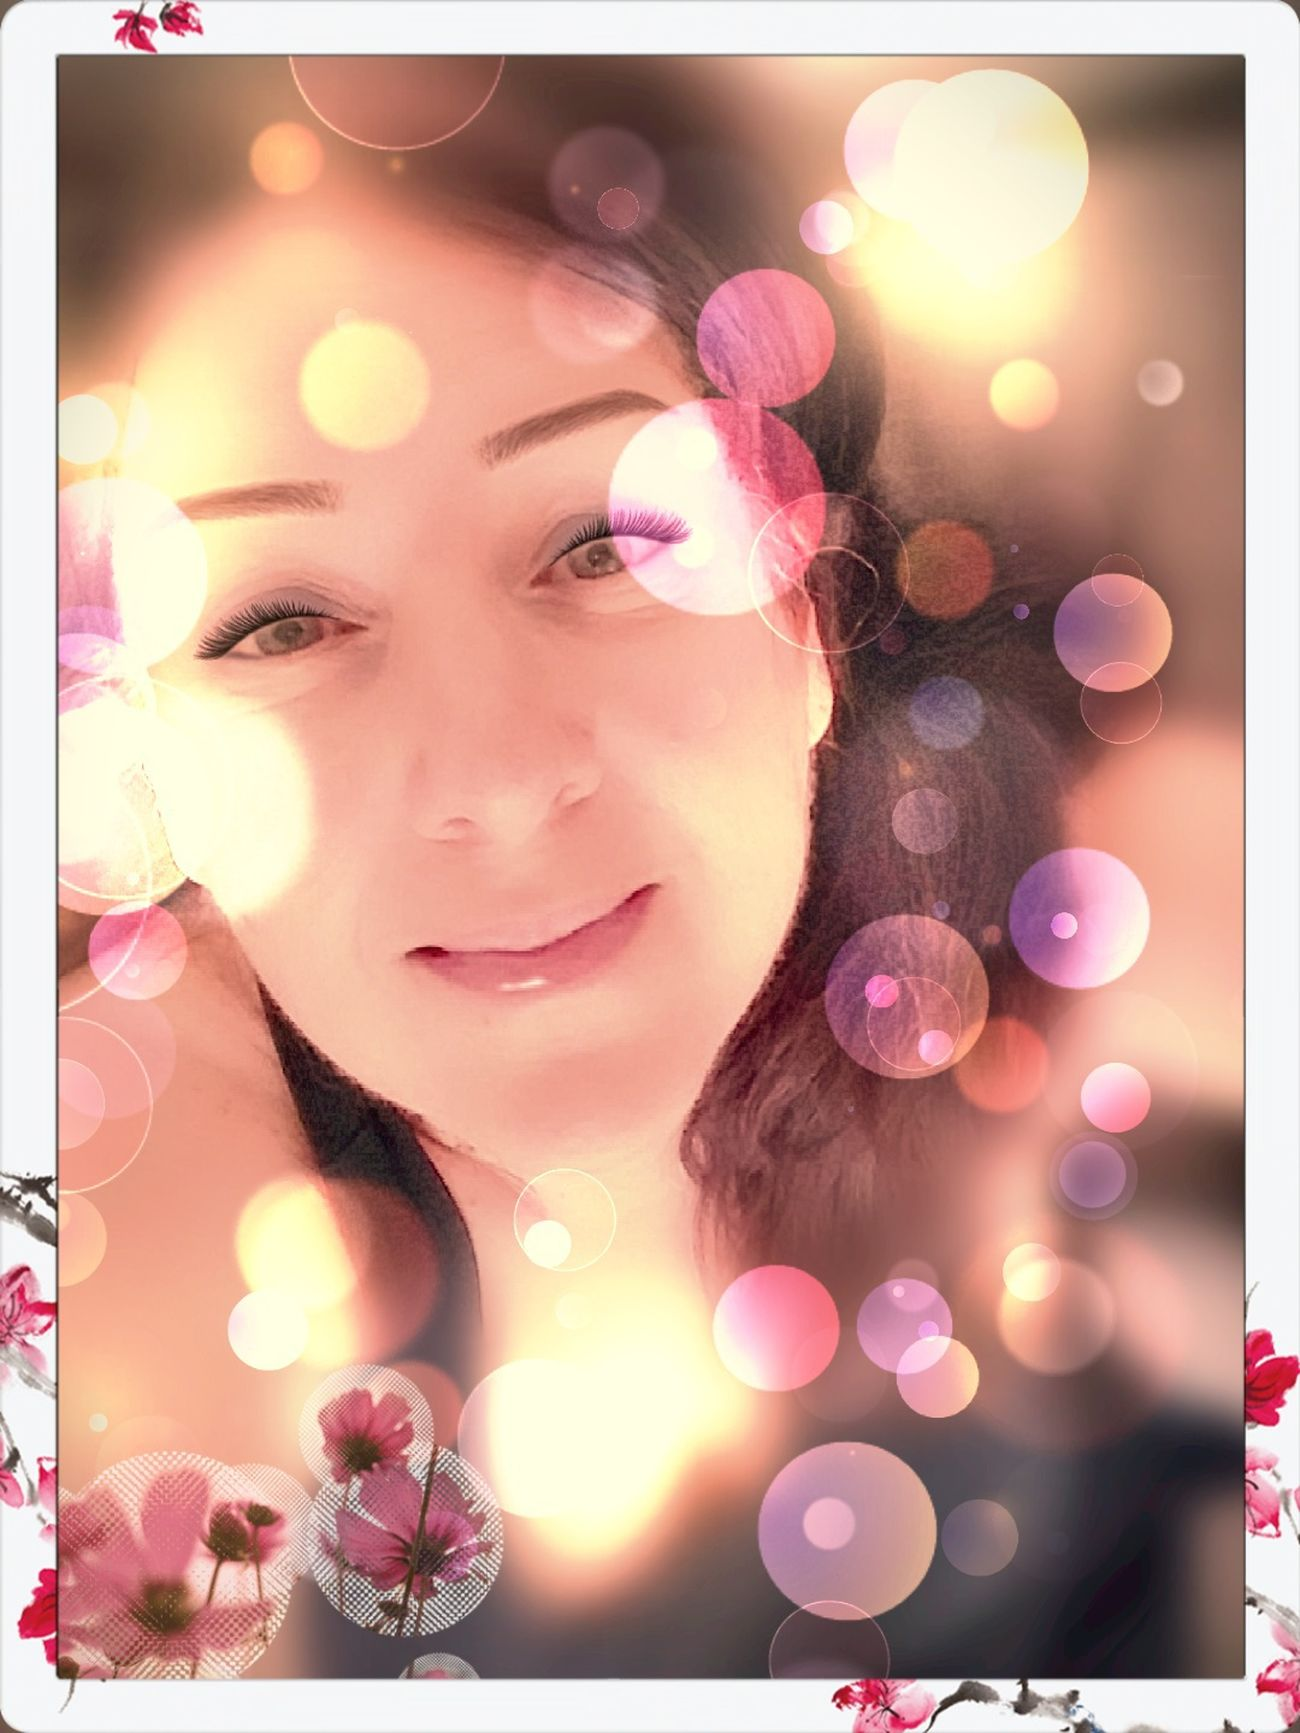 Beautiful Woman Portrait Digital Composite Human Face Close-up Artistic Photo Art, Drawing, Creativity Portrait Of A Woman Thats Me  Model Photography Portrait Photography Dark Hair Long Hair Flowers Model Green Eyes Shadows & Lights